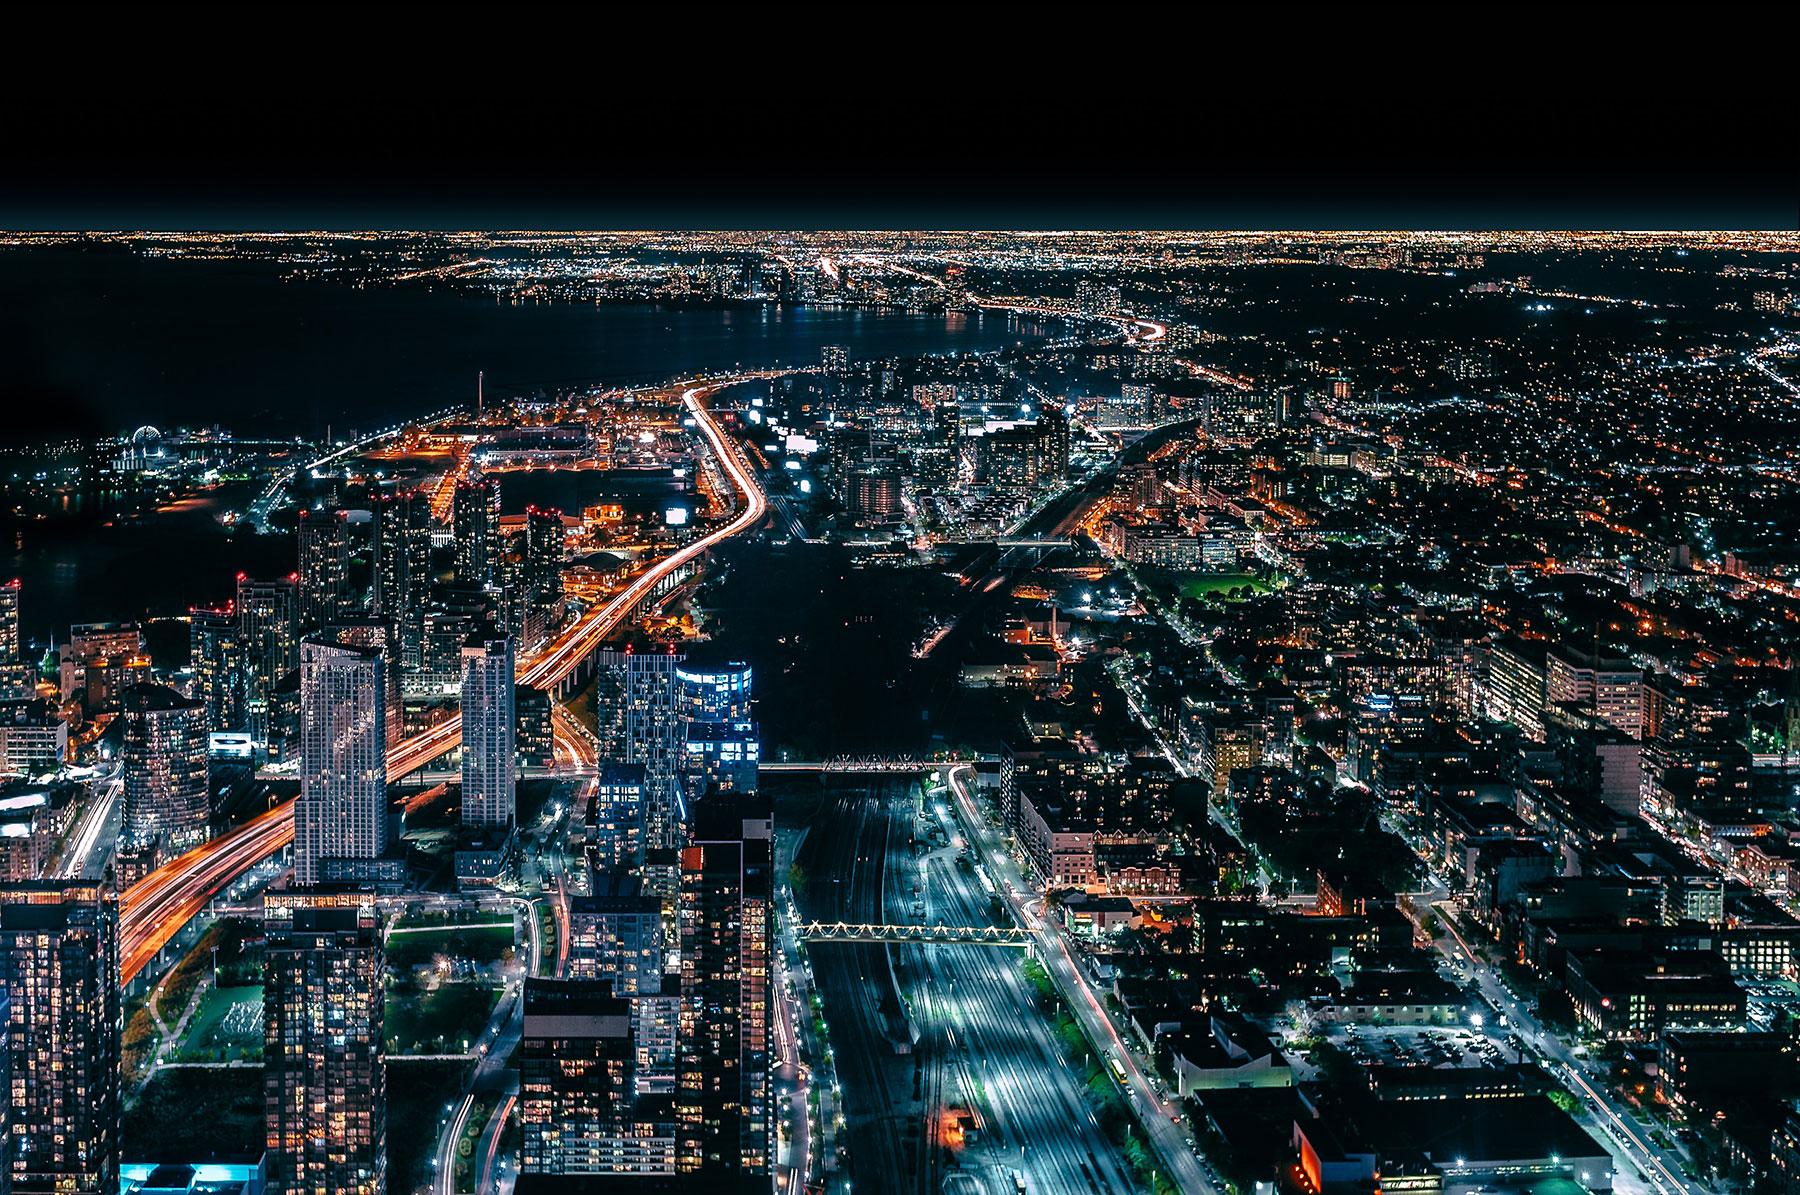 toronto-night-location-settings-unsplash